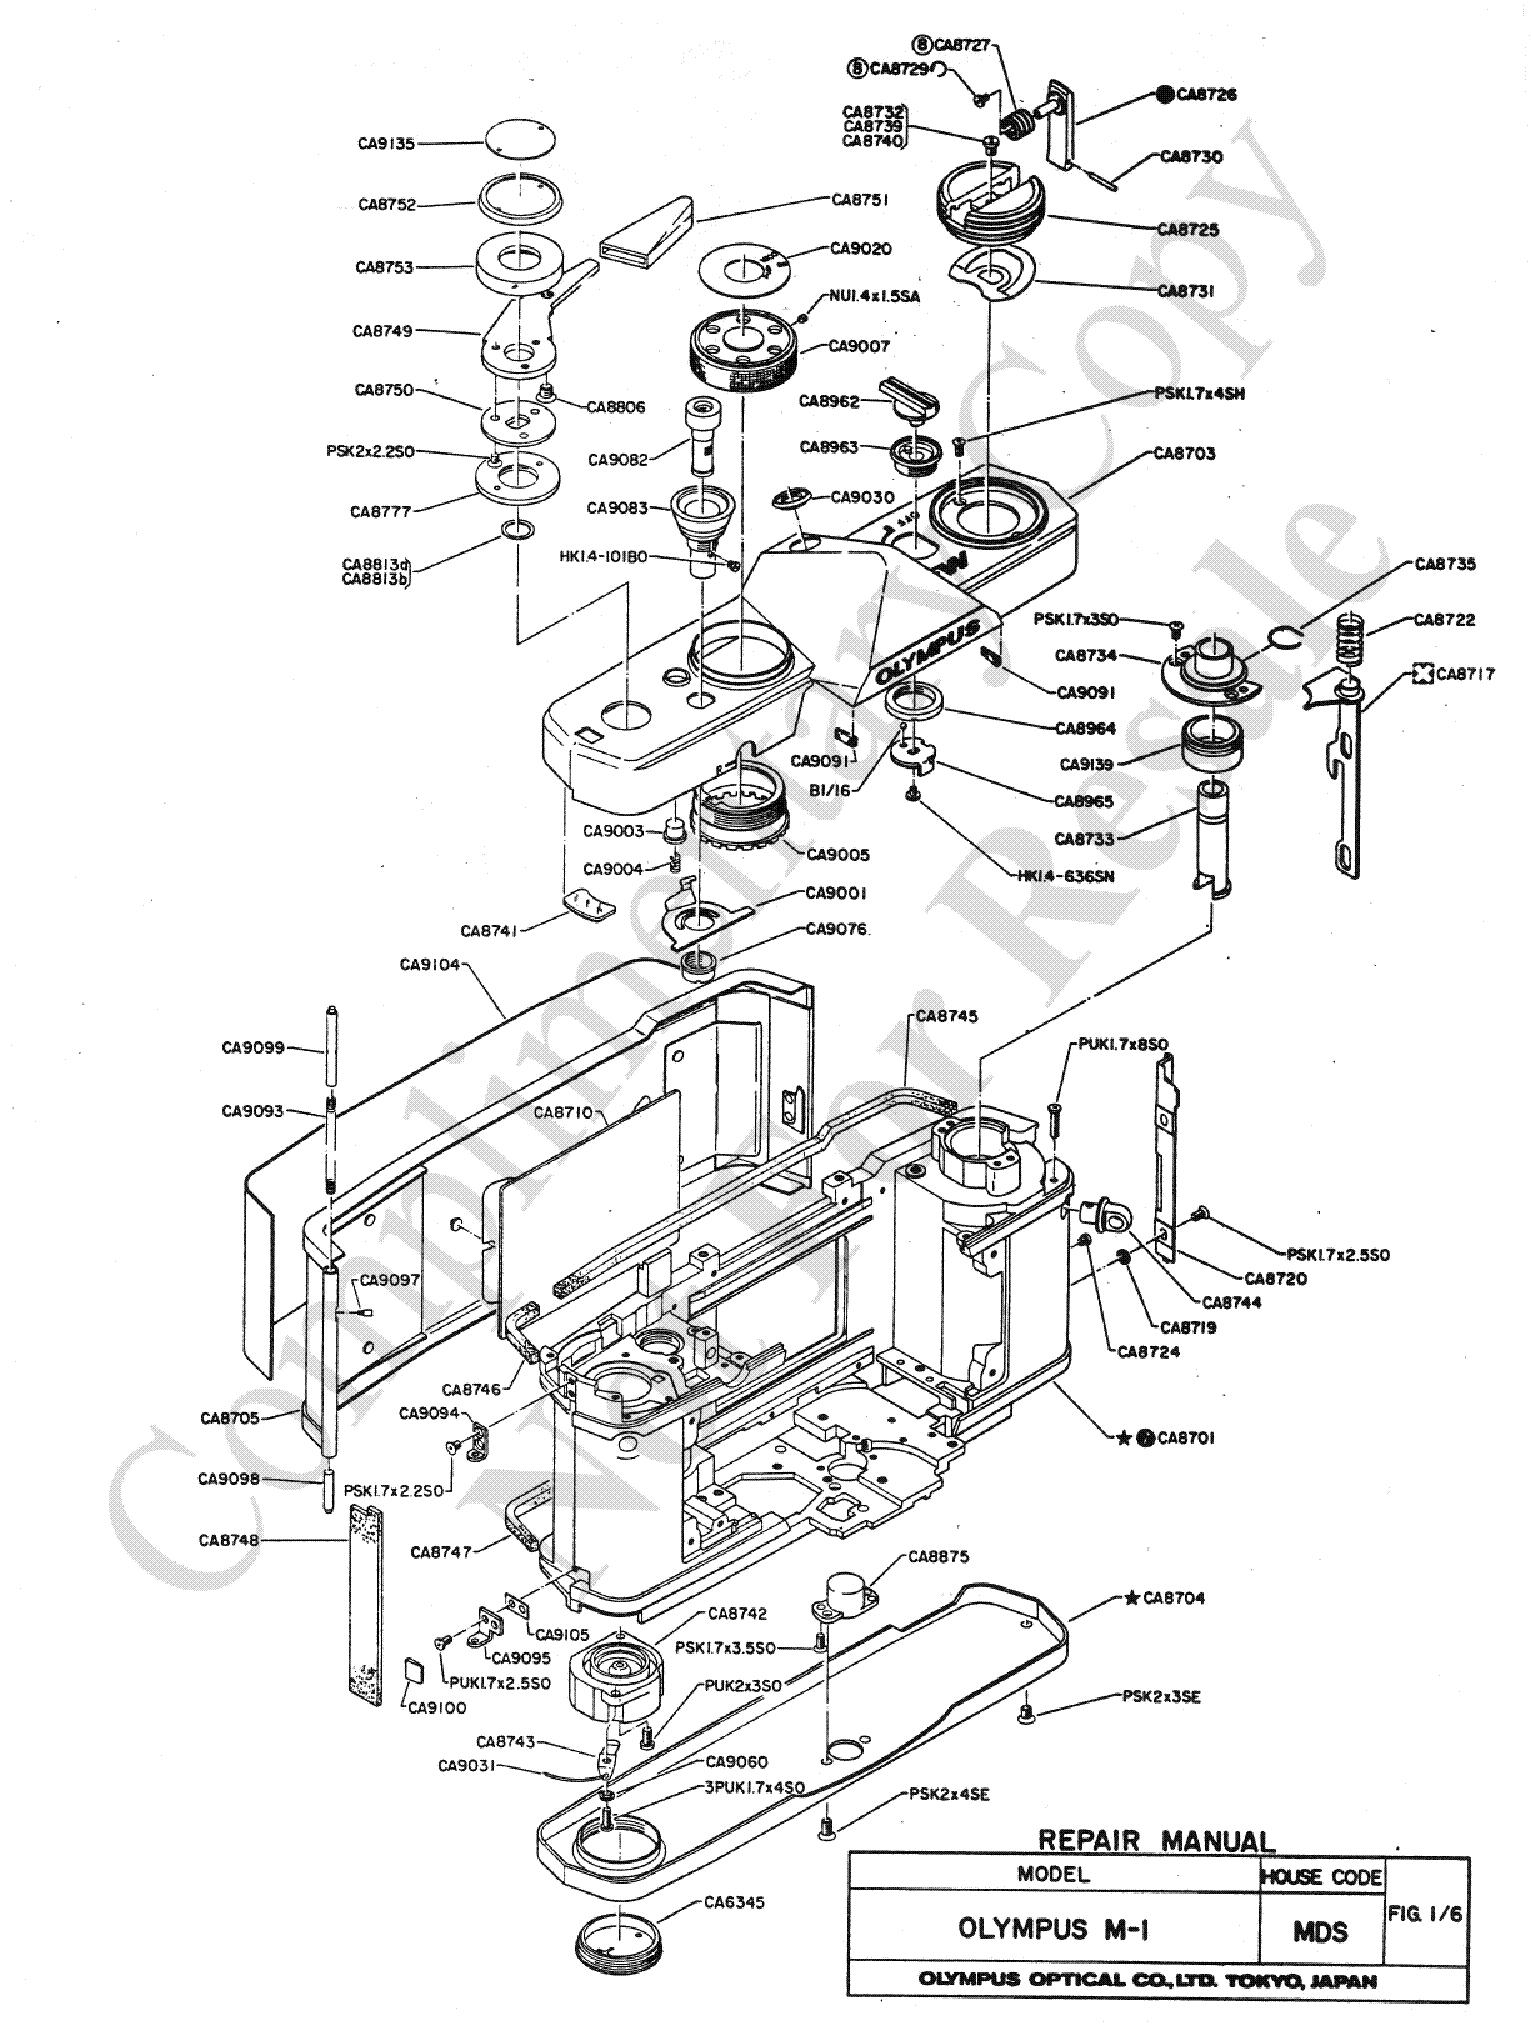 Toyota Solara Wire Diagram